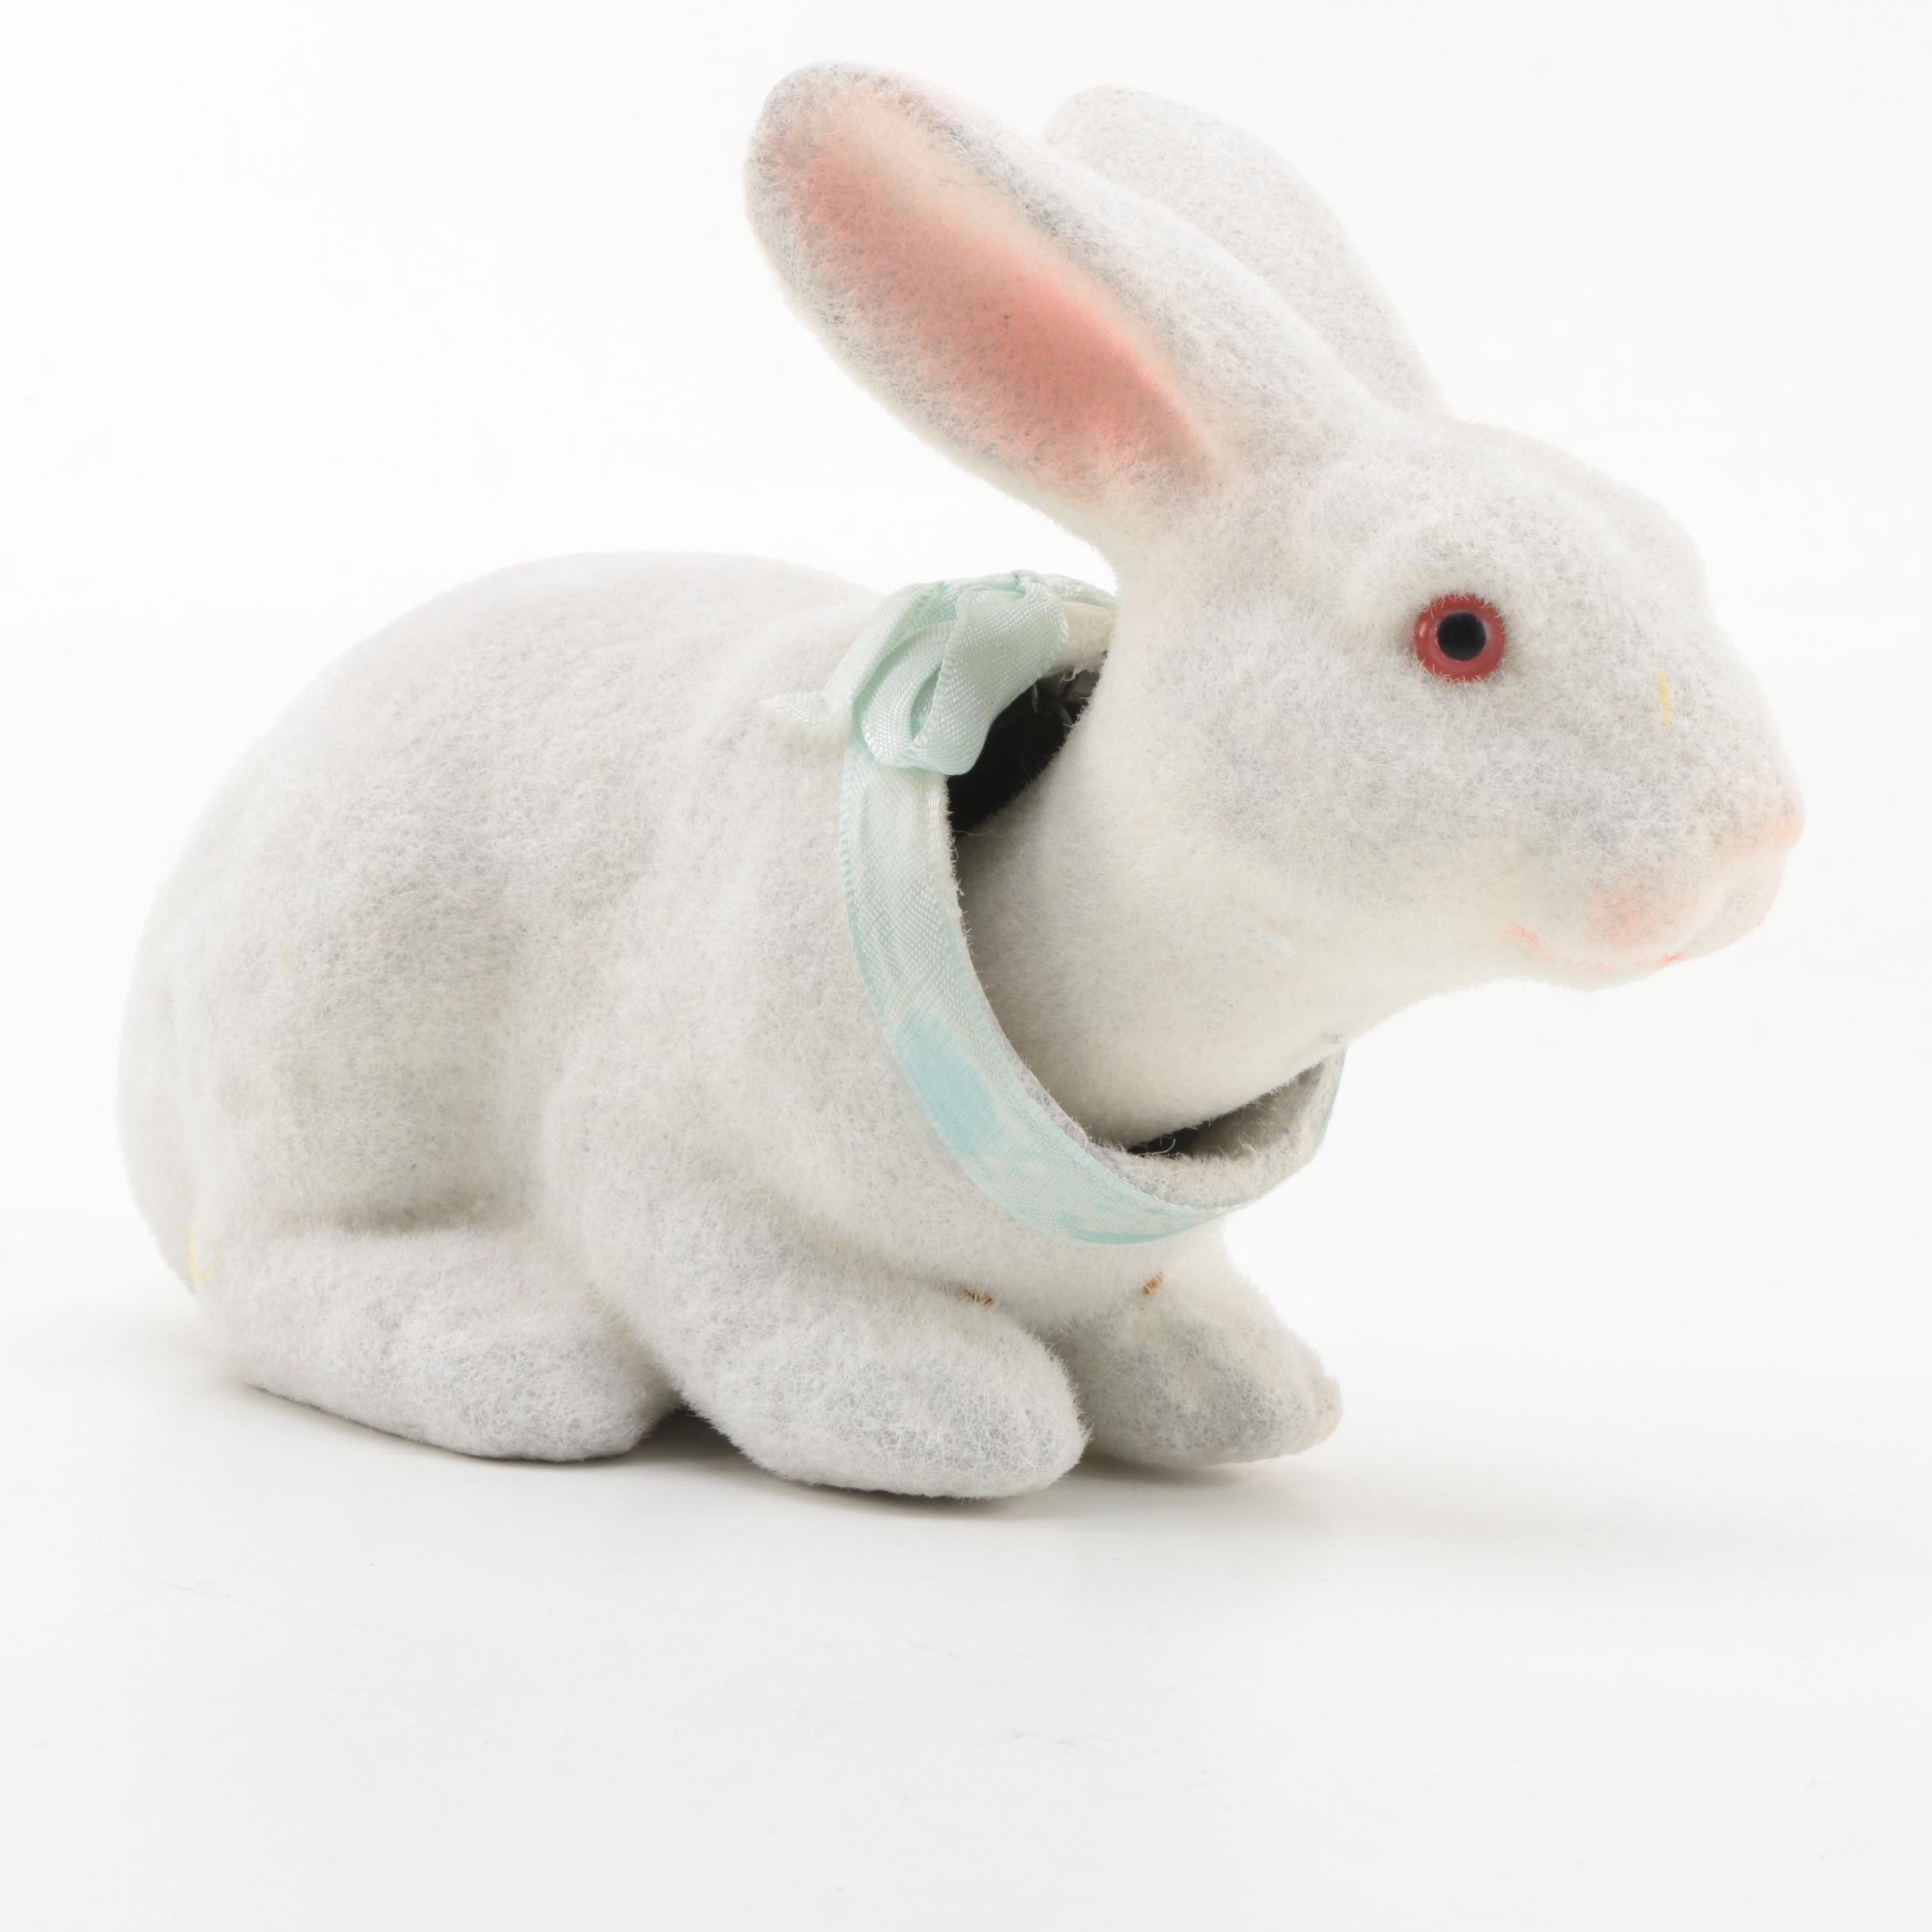 1950s Flocked Nodding Bunny Figurine